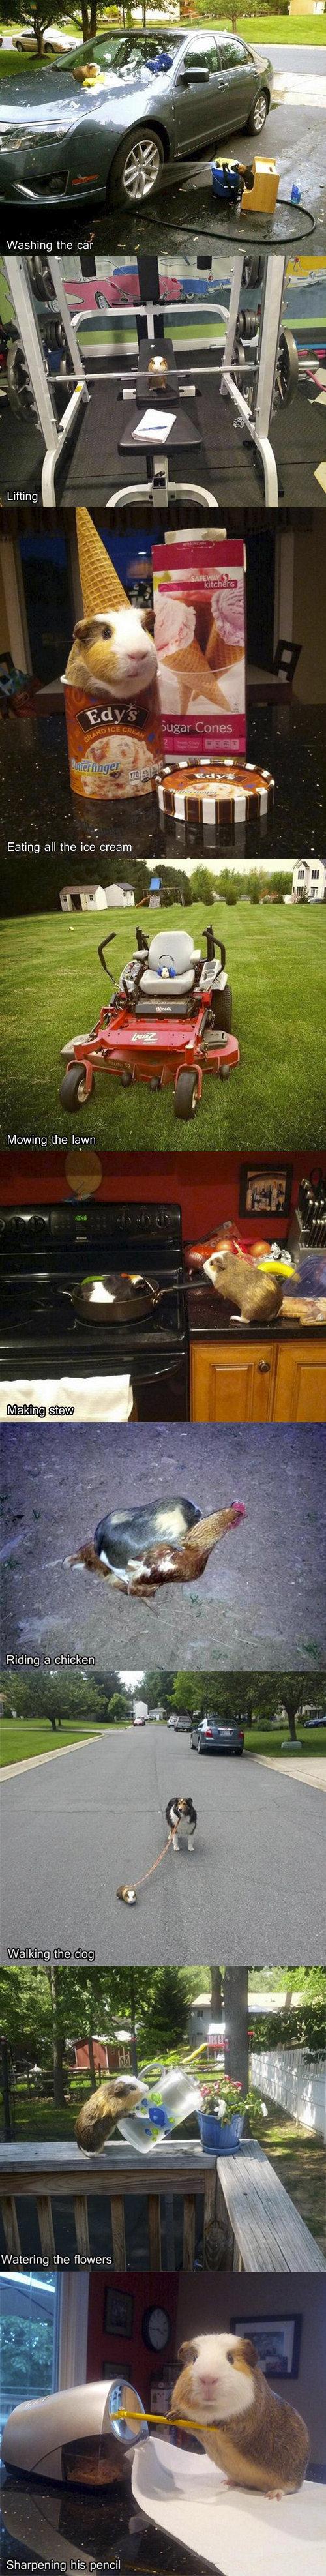 "Guinea Pig. . Washing the ca; - 3 Lifting Ricking, iife. rii. aii"" ii' i. if if If'. Inn. at Sharpening his. pencil"